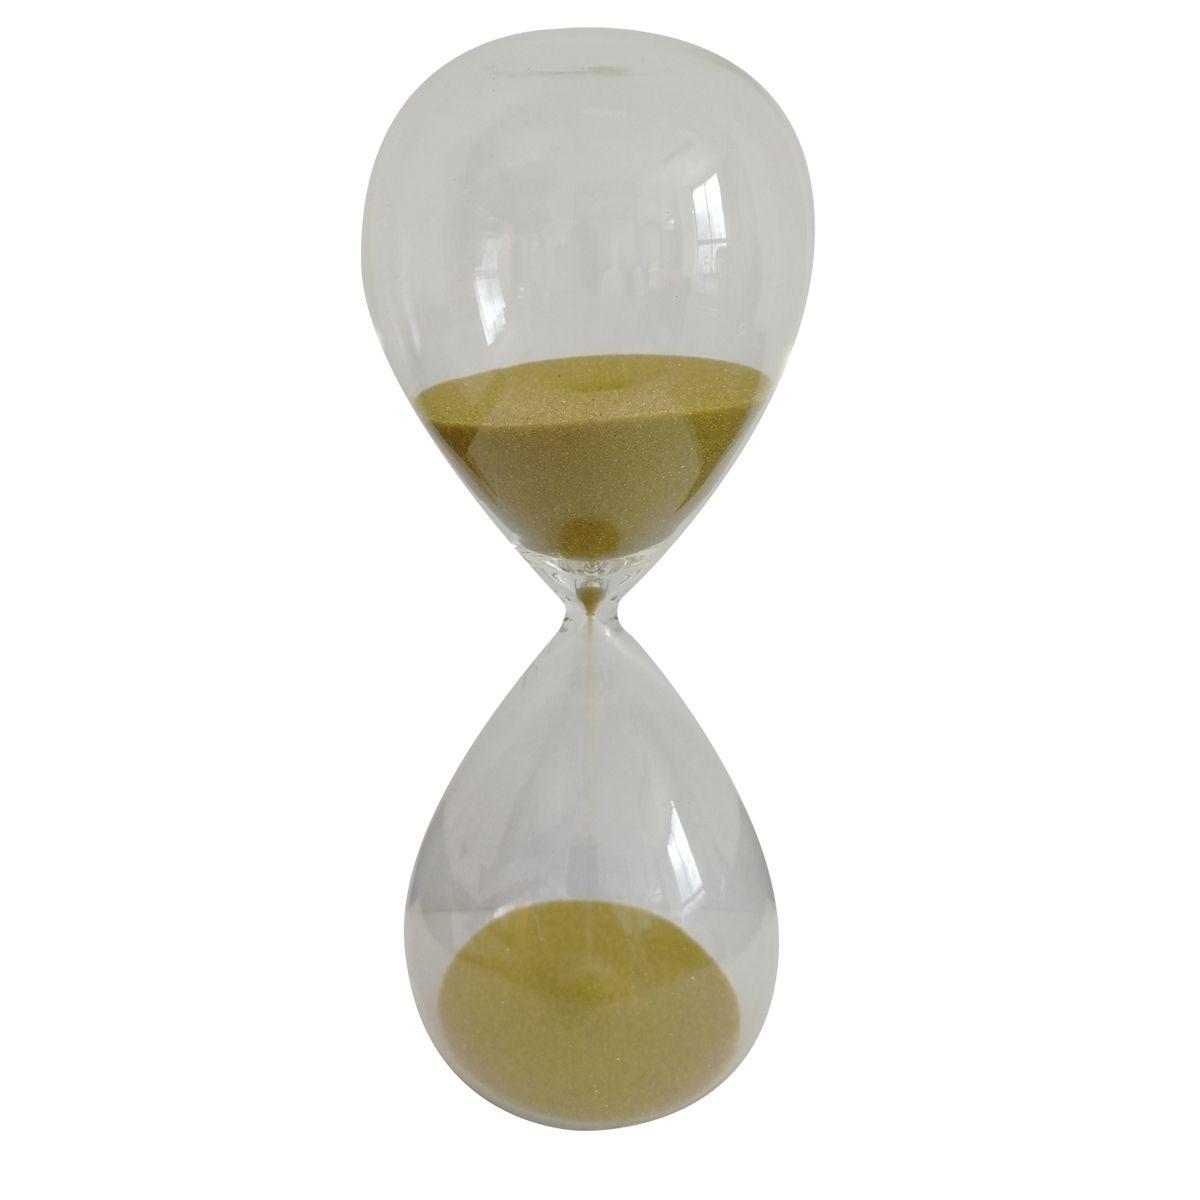 AMPULHETA VIDRO CLEAR GLASS DOURADO 20 MIN 6,5X6,5X17CM - URBAN 42743